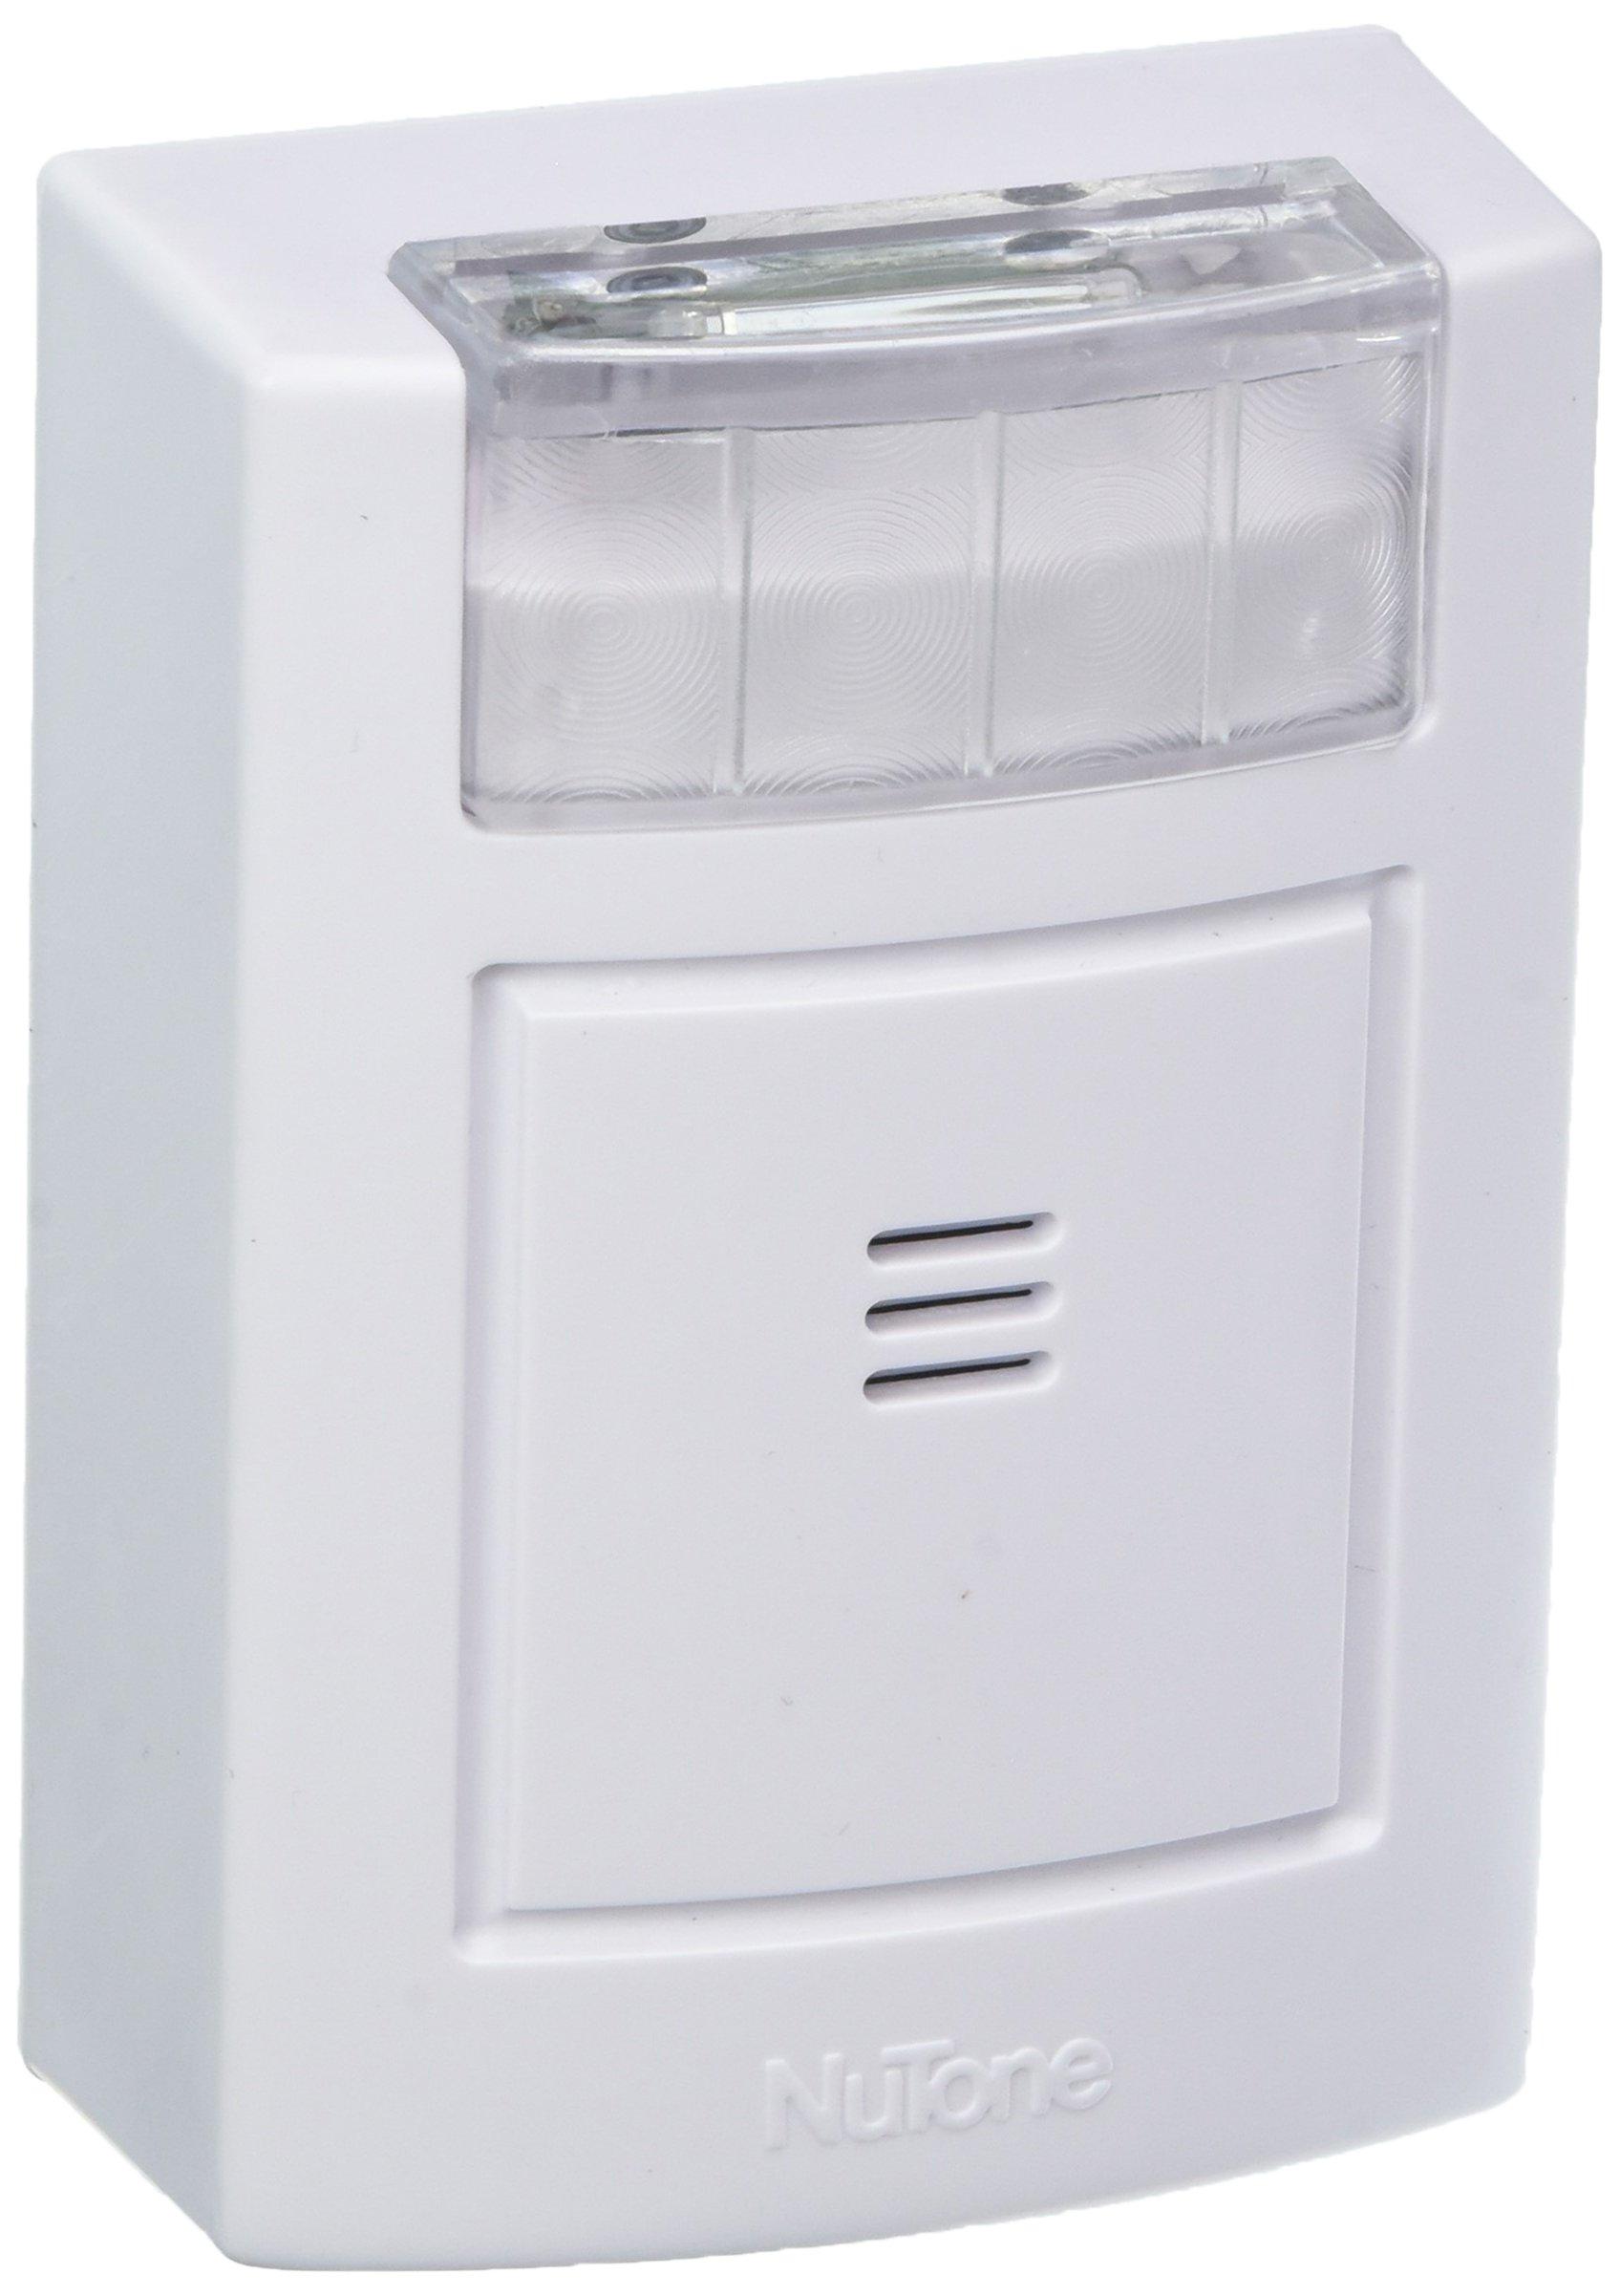 NuTone Wireless Chime Receiver with Strobe - LA224RWH